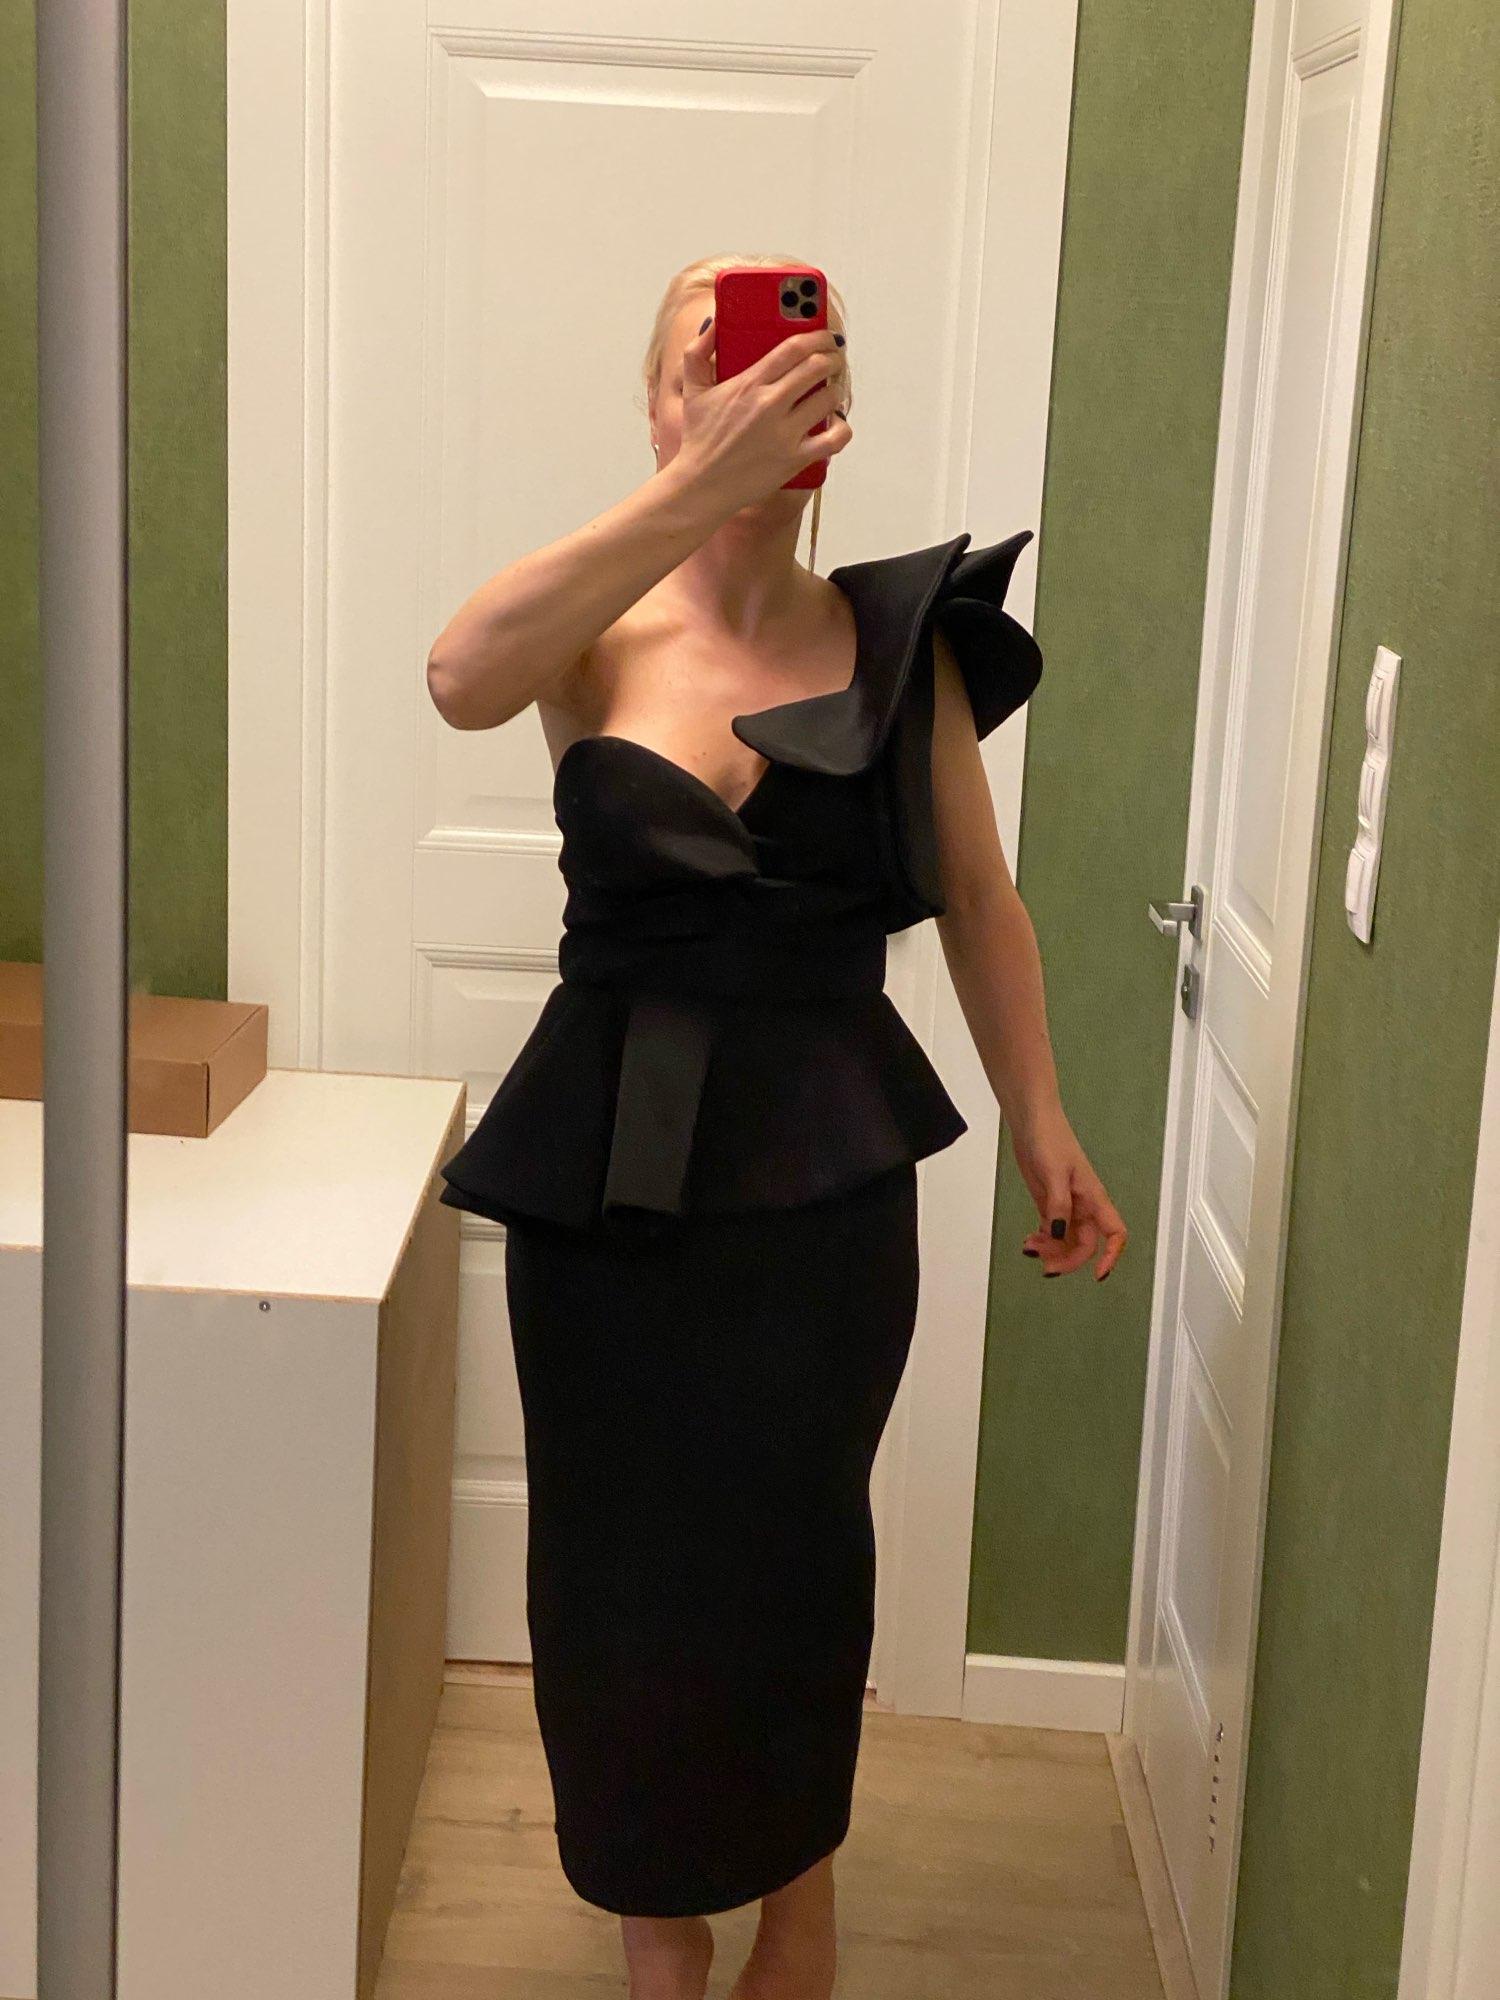 Missord 2020 Women Sexy Bodycon Off Shoulder Bandage Dresses Female Ruffles Backless Elegant Club Summer Dress Vestido TB0020 reviews №1 611685